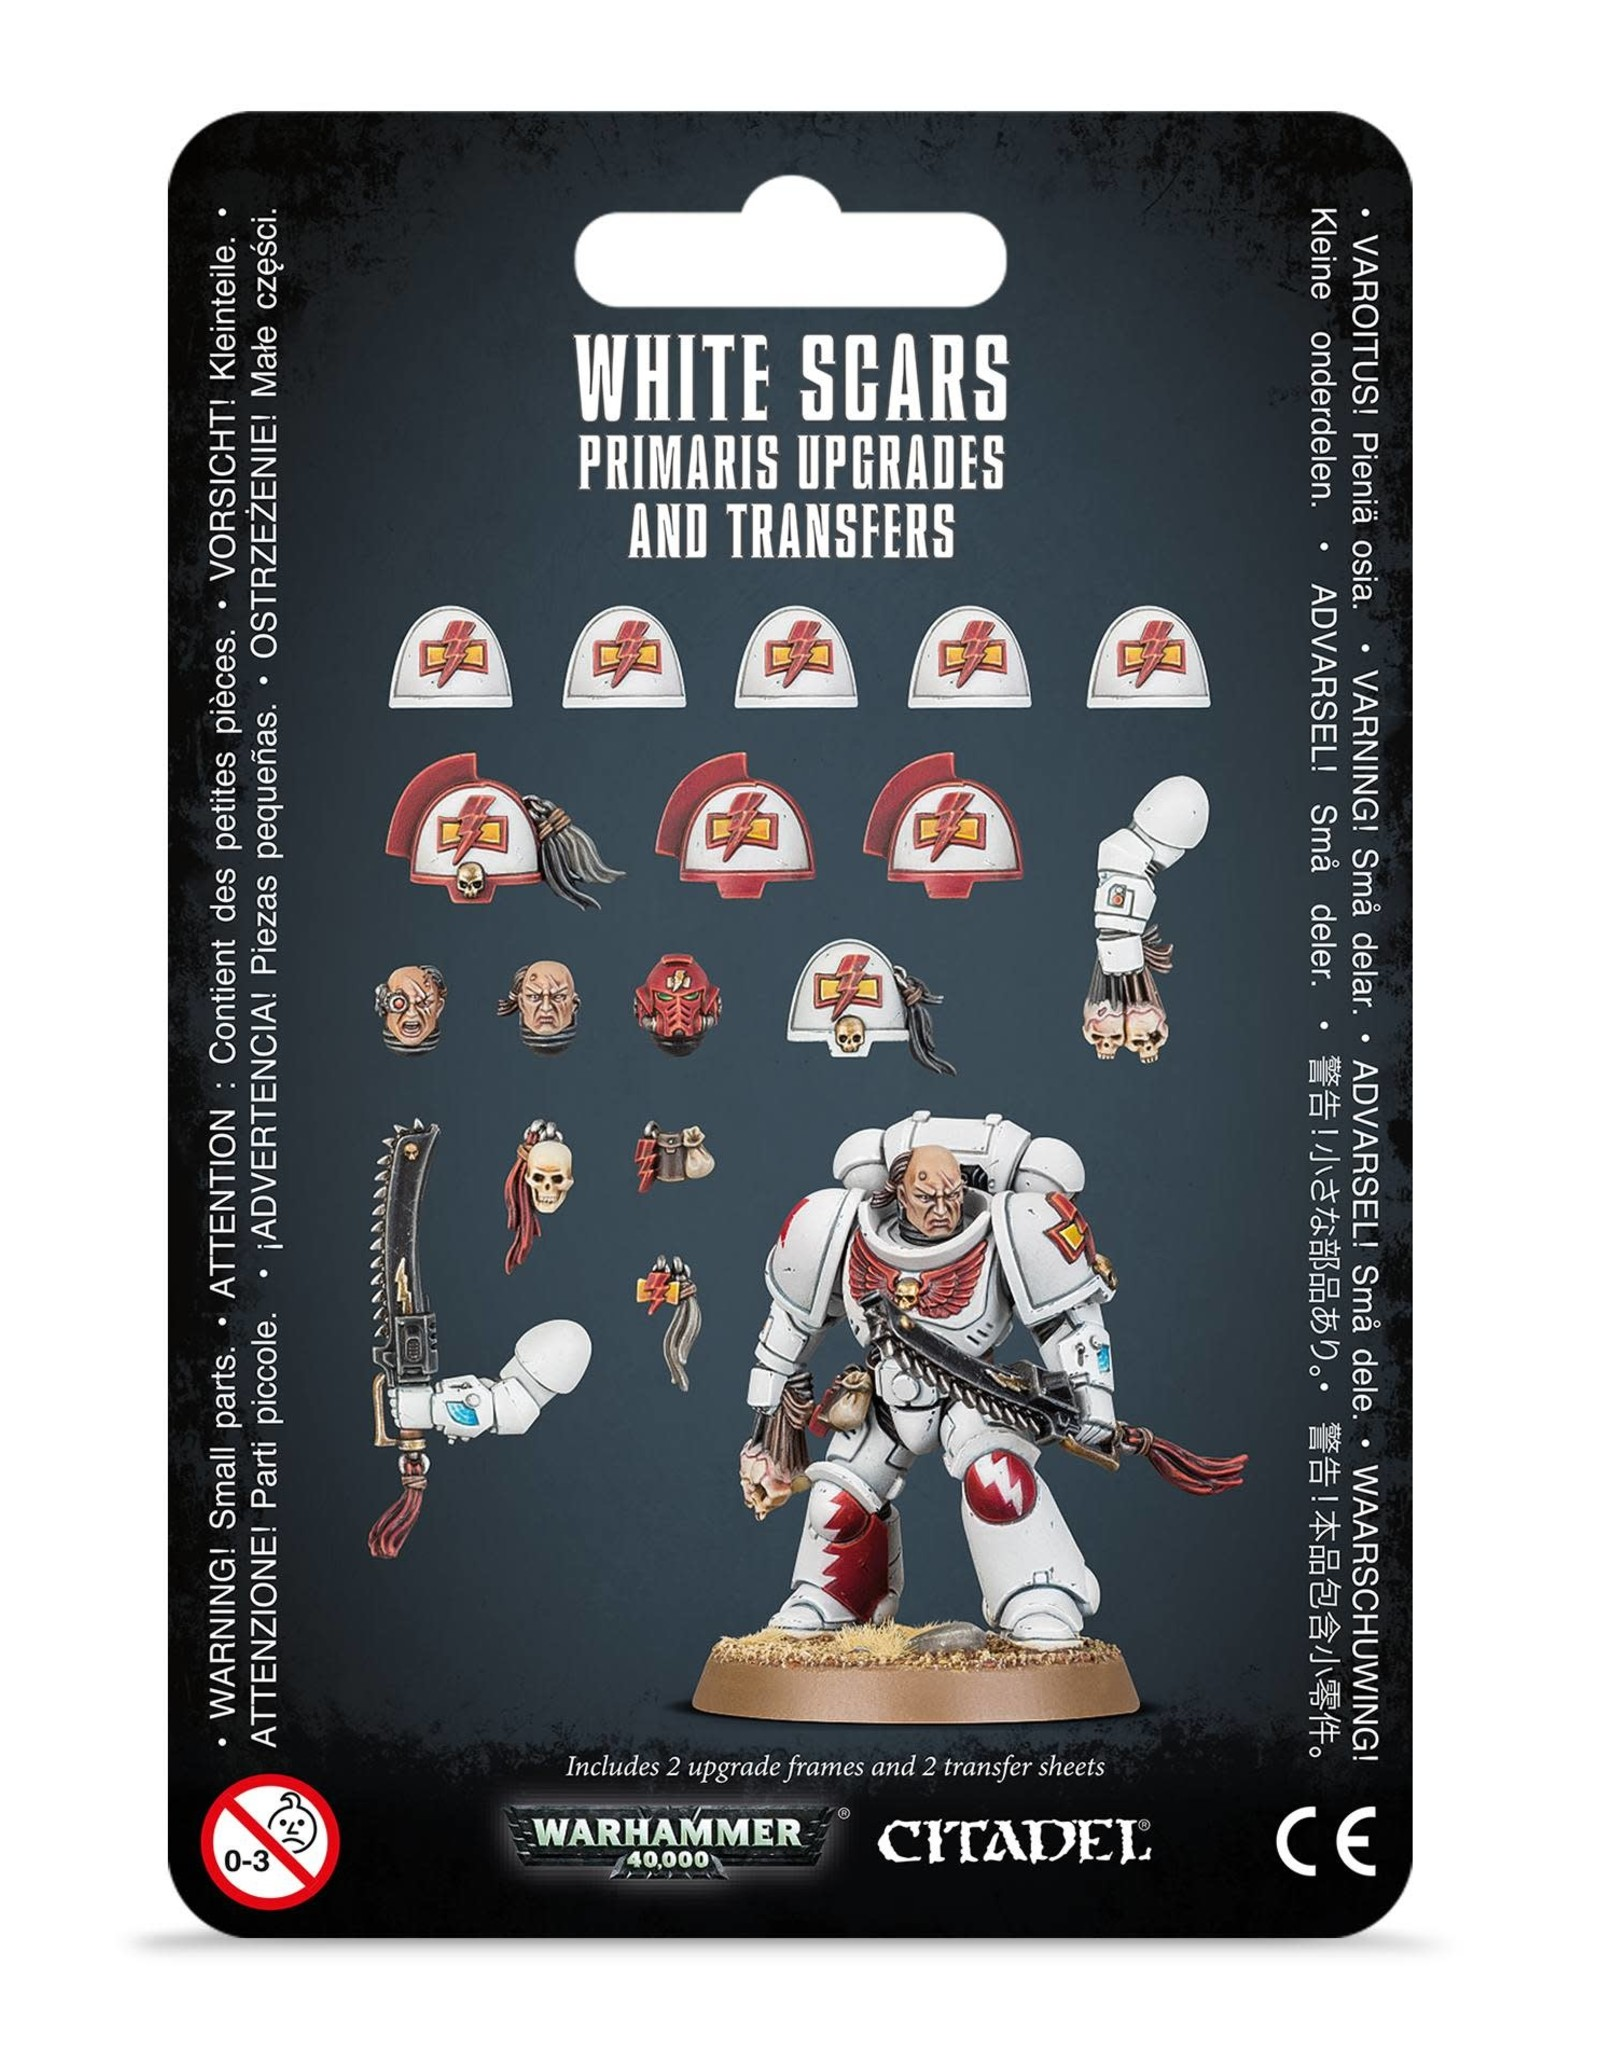 Warhammer 40K White Scar Primaris Upgrades and Transfers